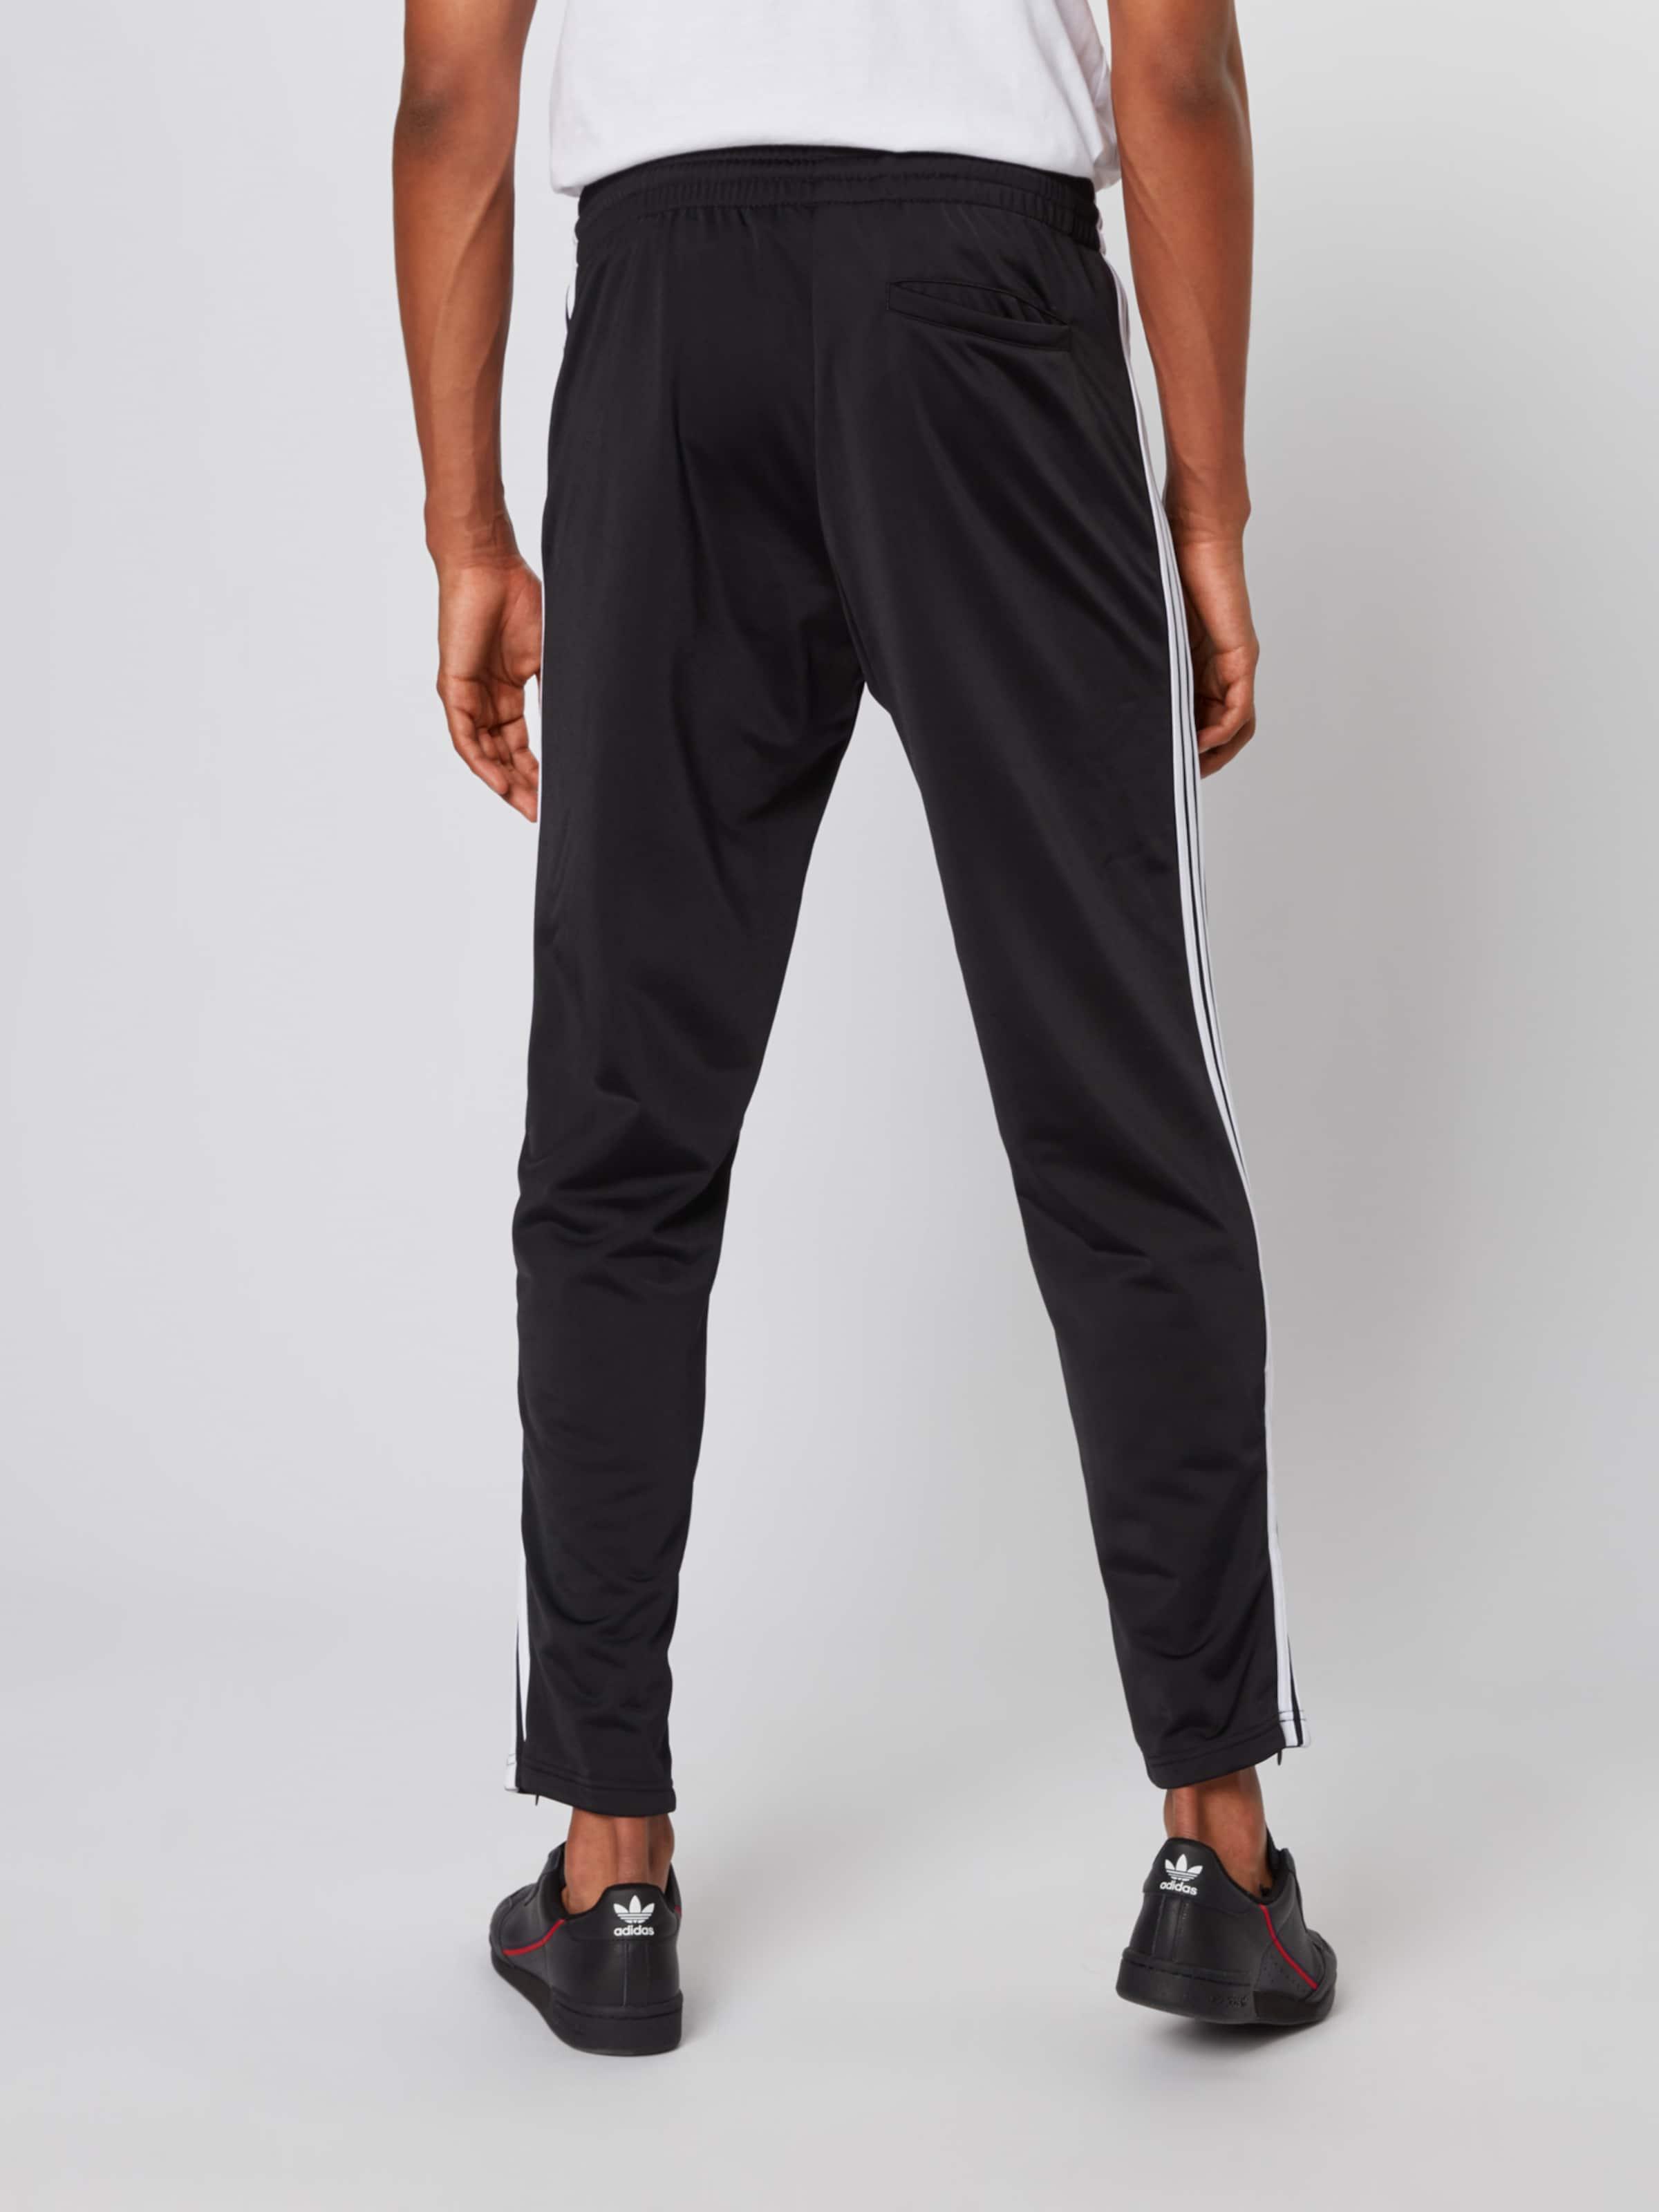 Pantalon Tp' Noir 'firebird Originals En Adidas 3L54qcjRA